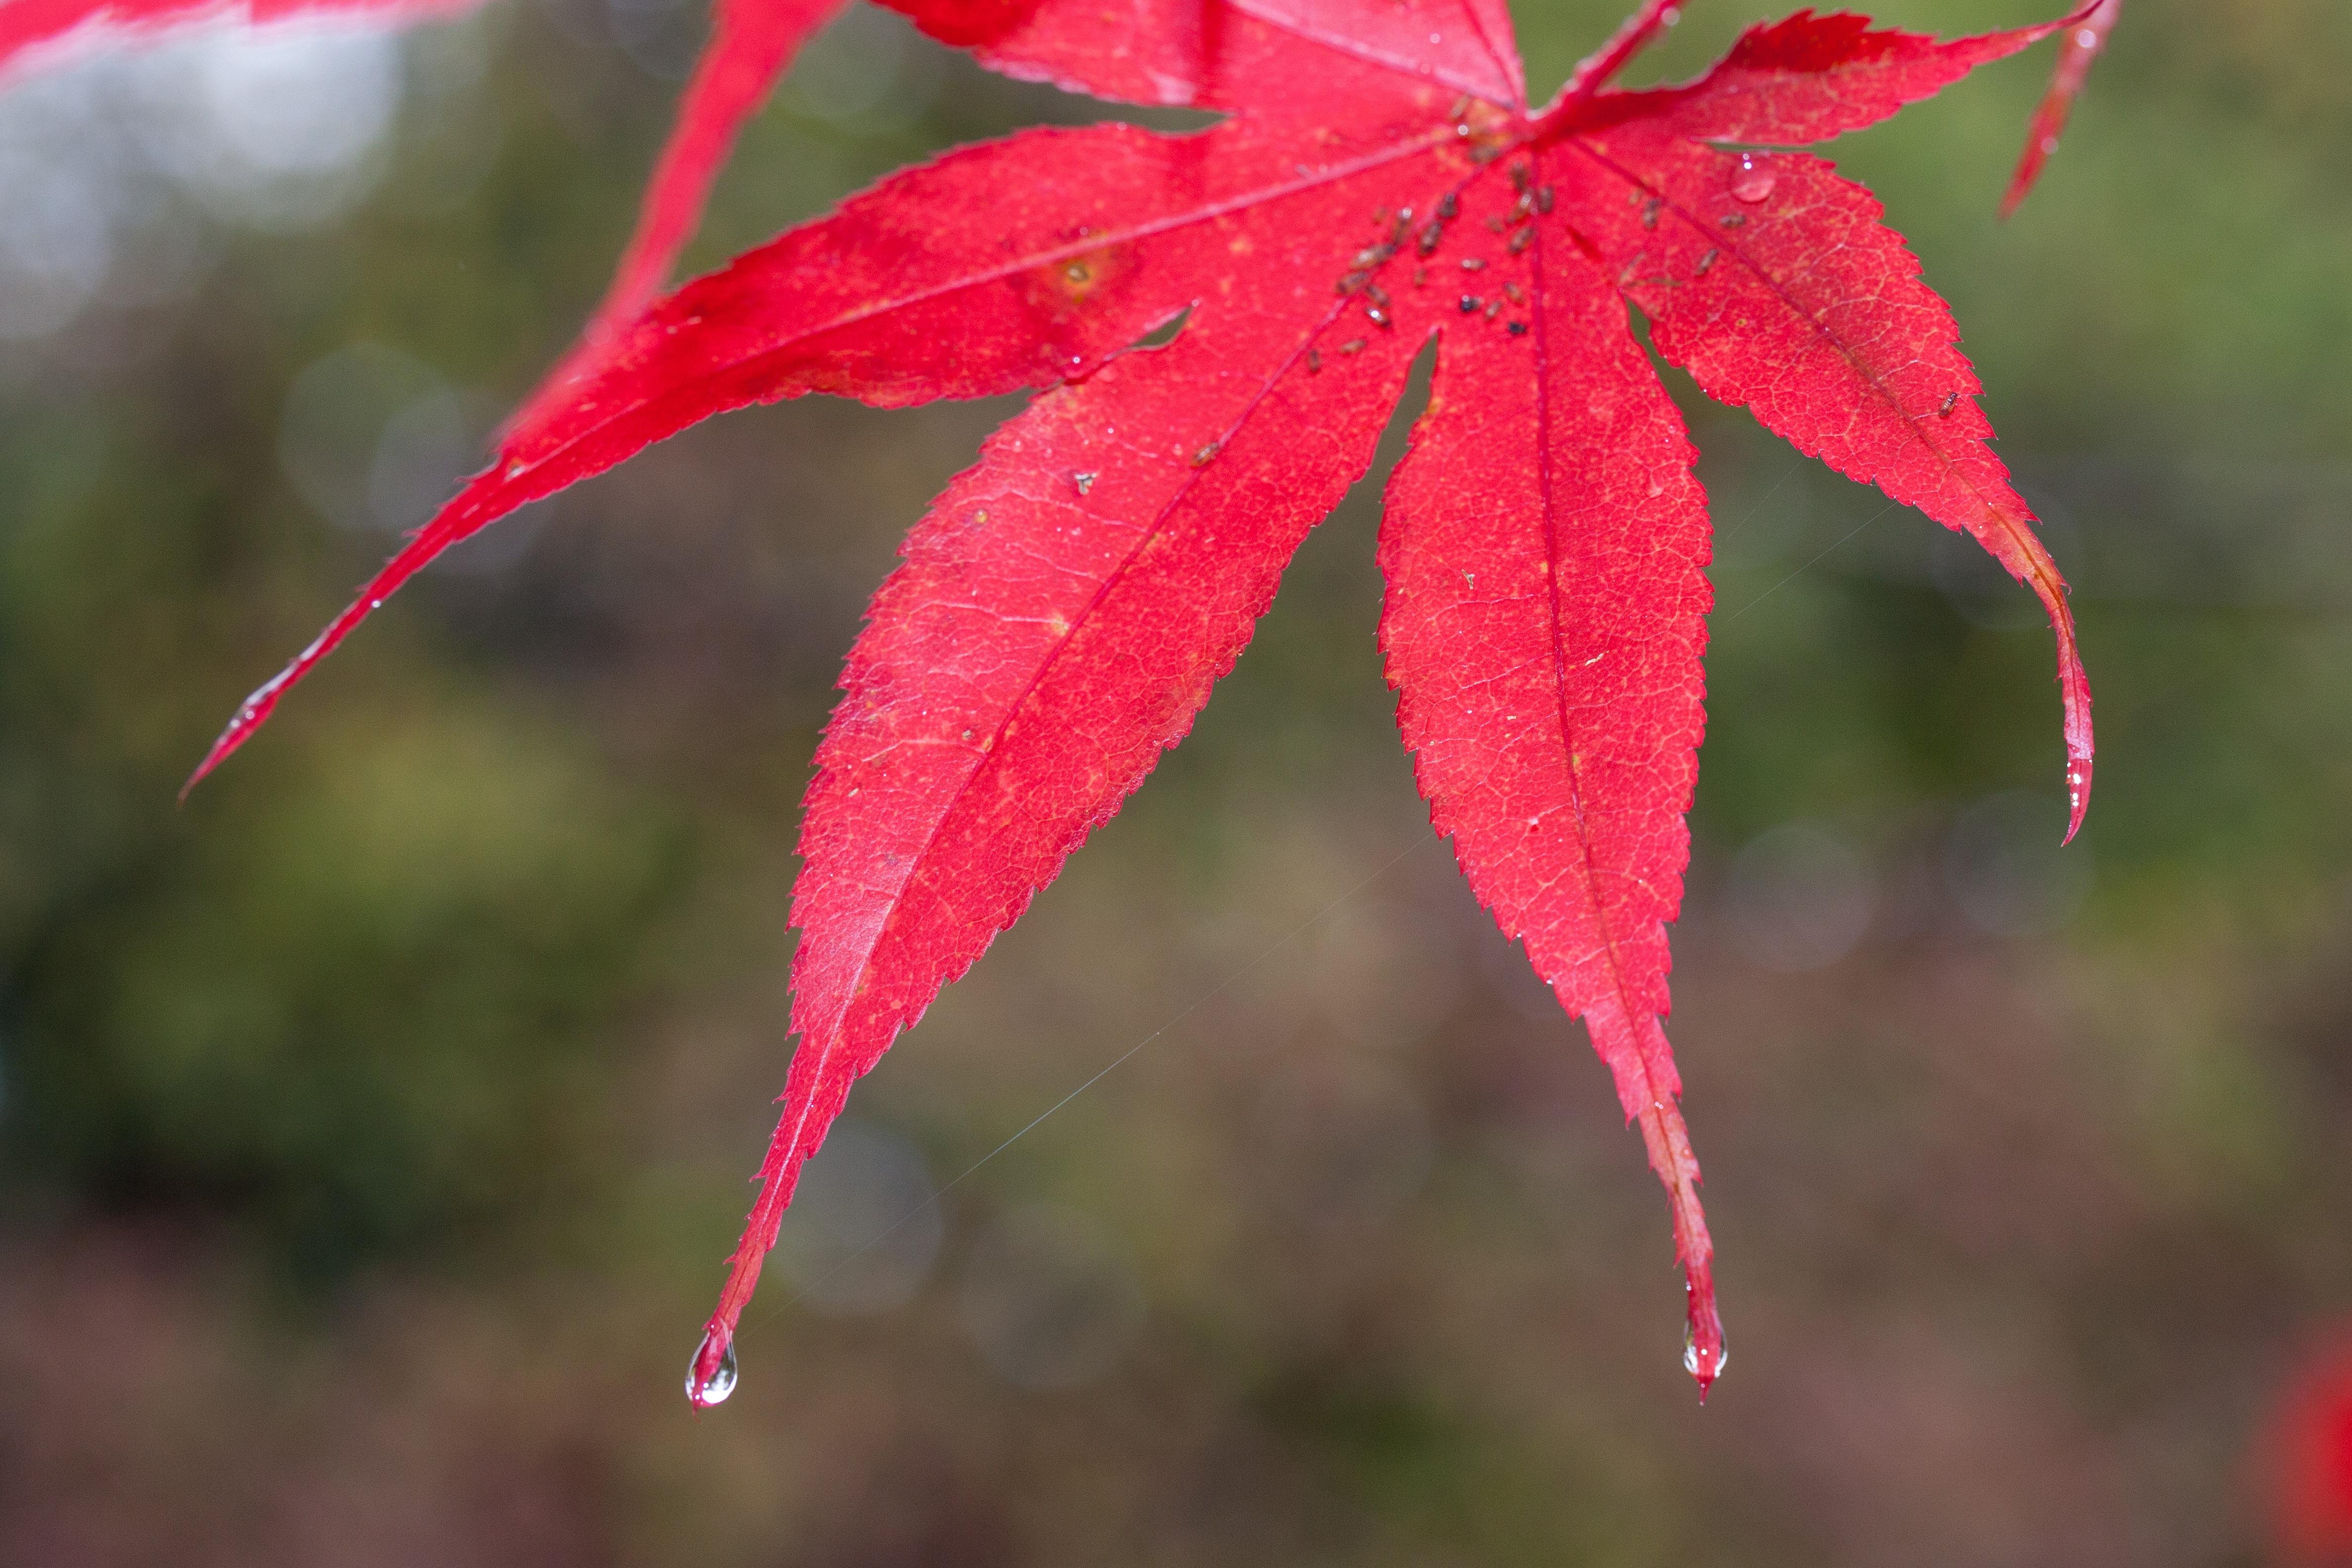 free images rain raindrop red color autumn colorful flora